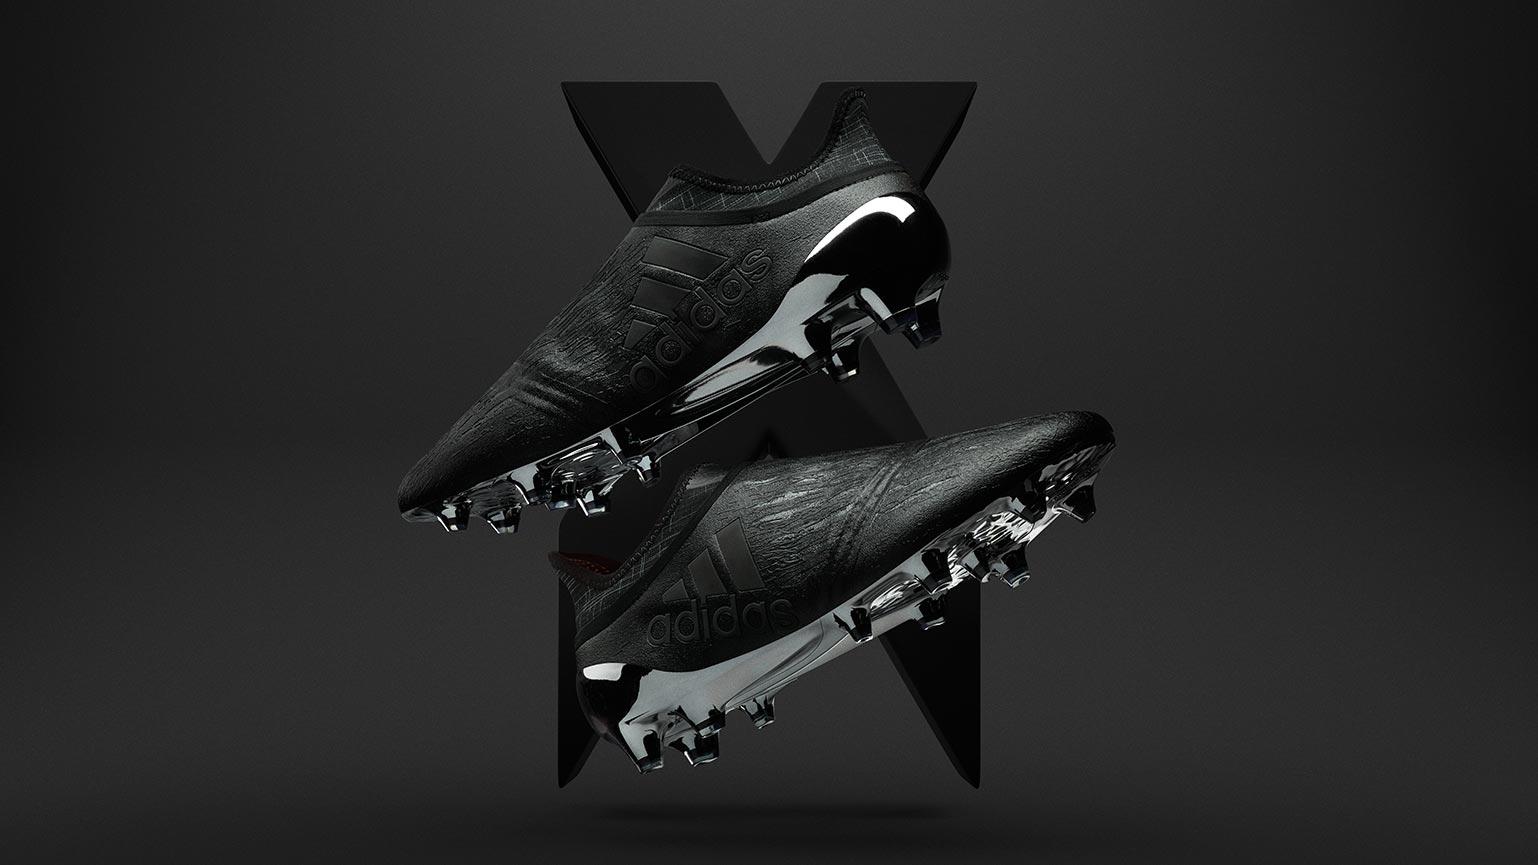 Blackout Adidas X 16+ Purechaos 201617 Dark Space Pack